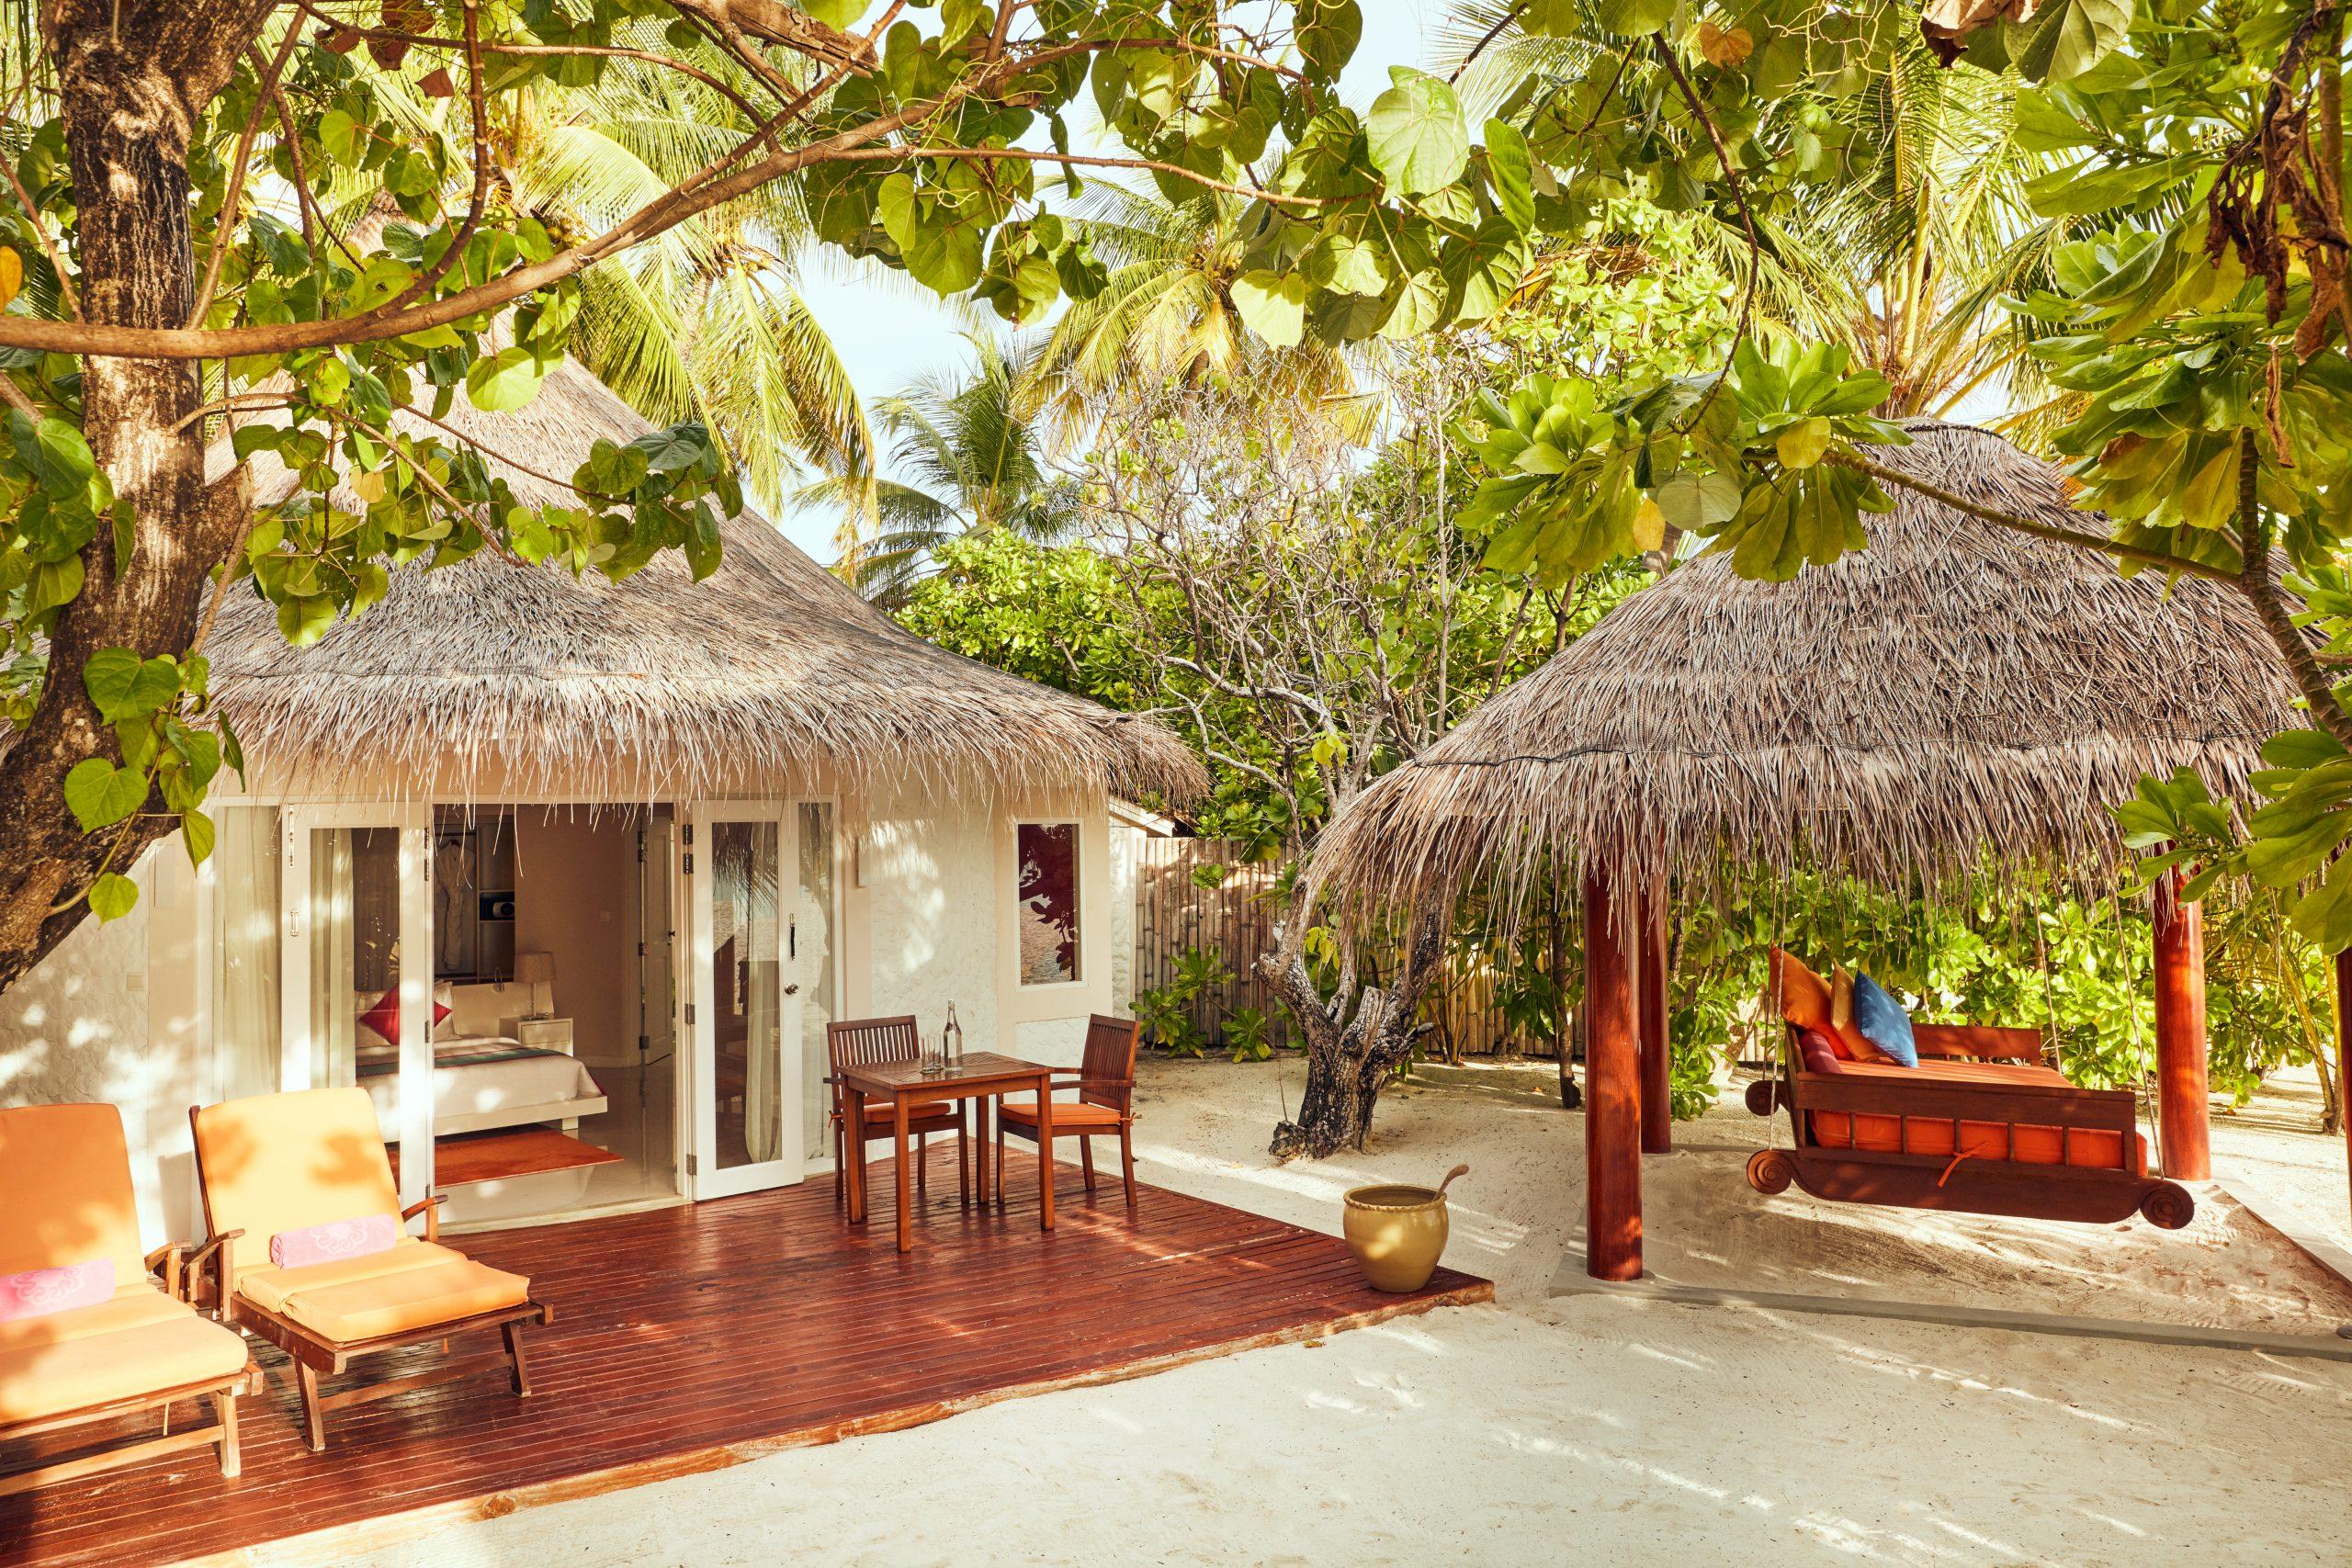 Casute tropicale - The Lounge